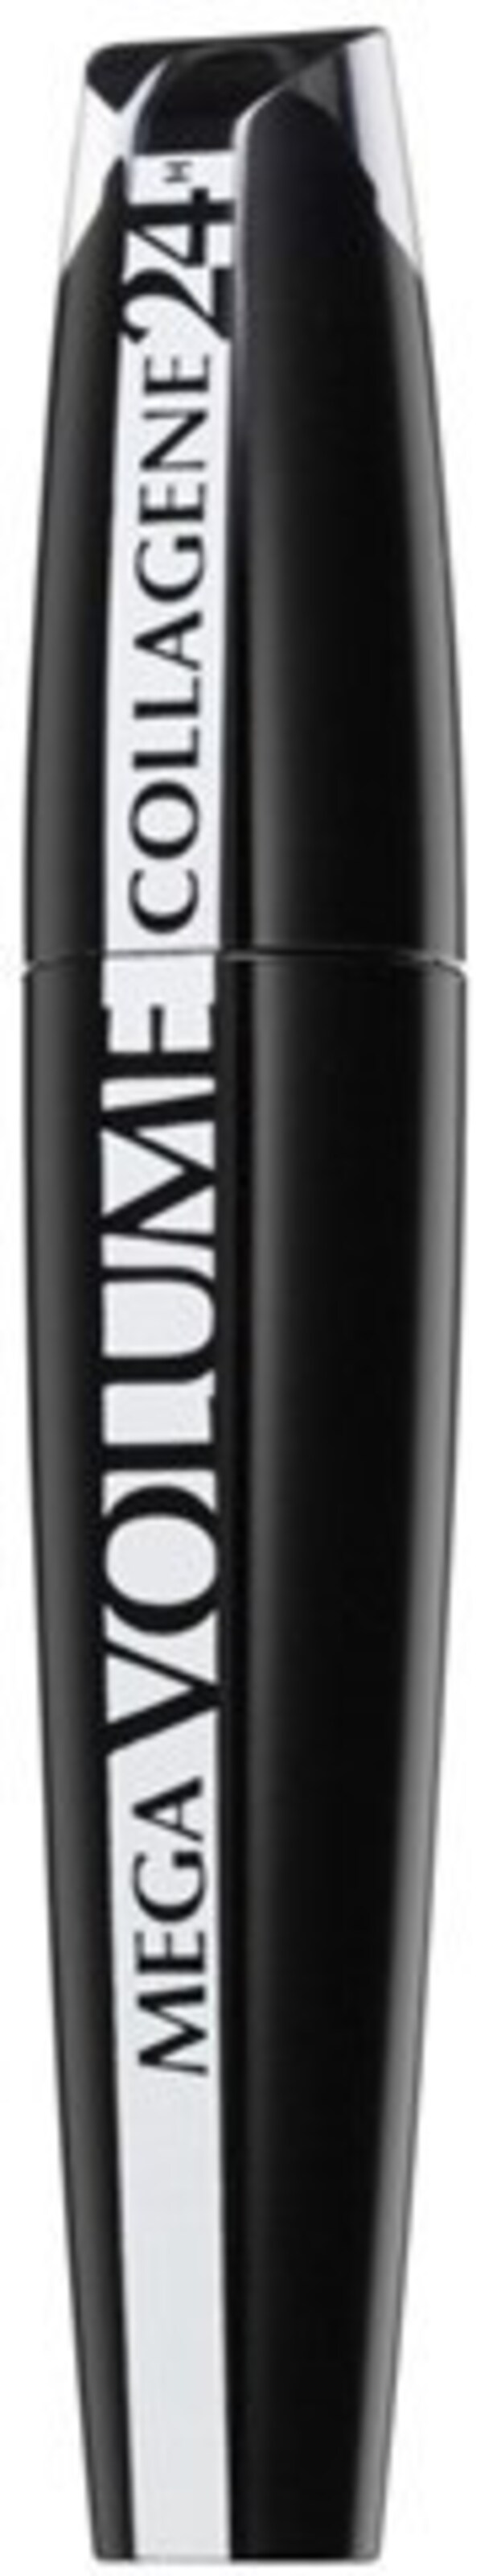 Schwarz 24h'Mascara Collagene Paris 'mega L'oréal Volume In UVMqSzpG